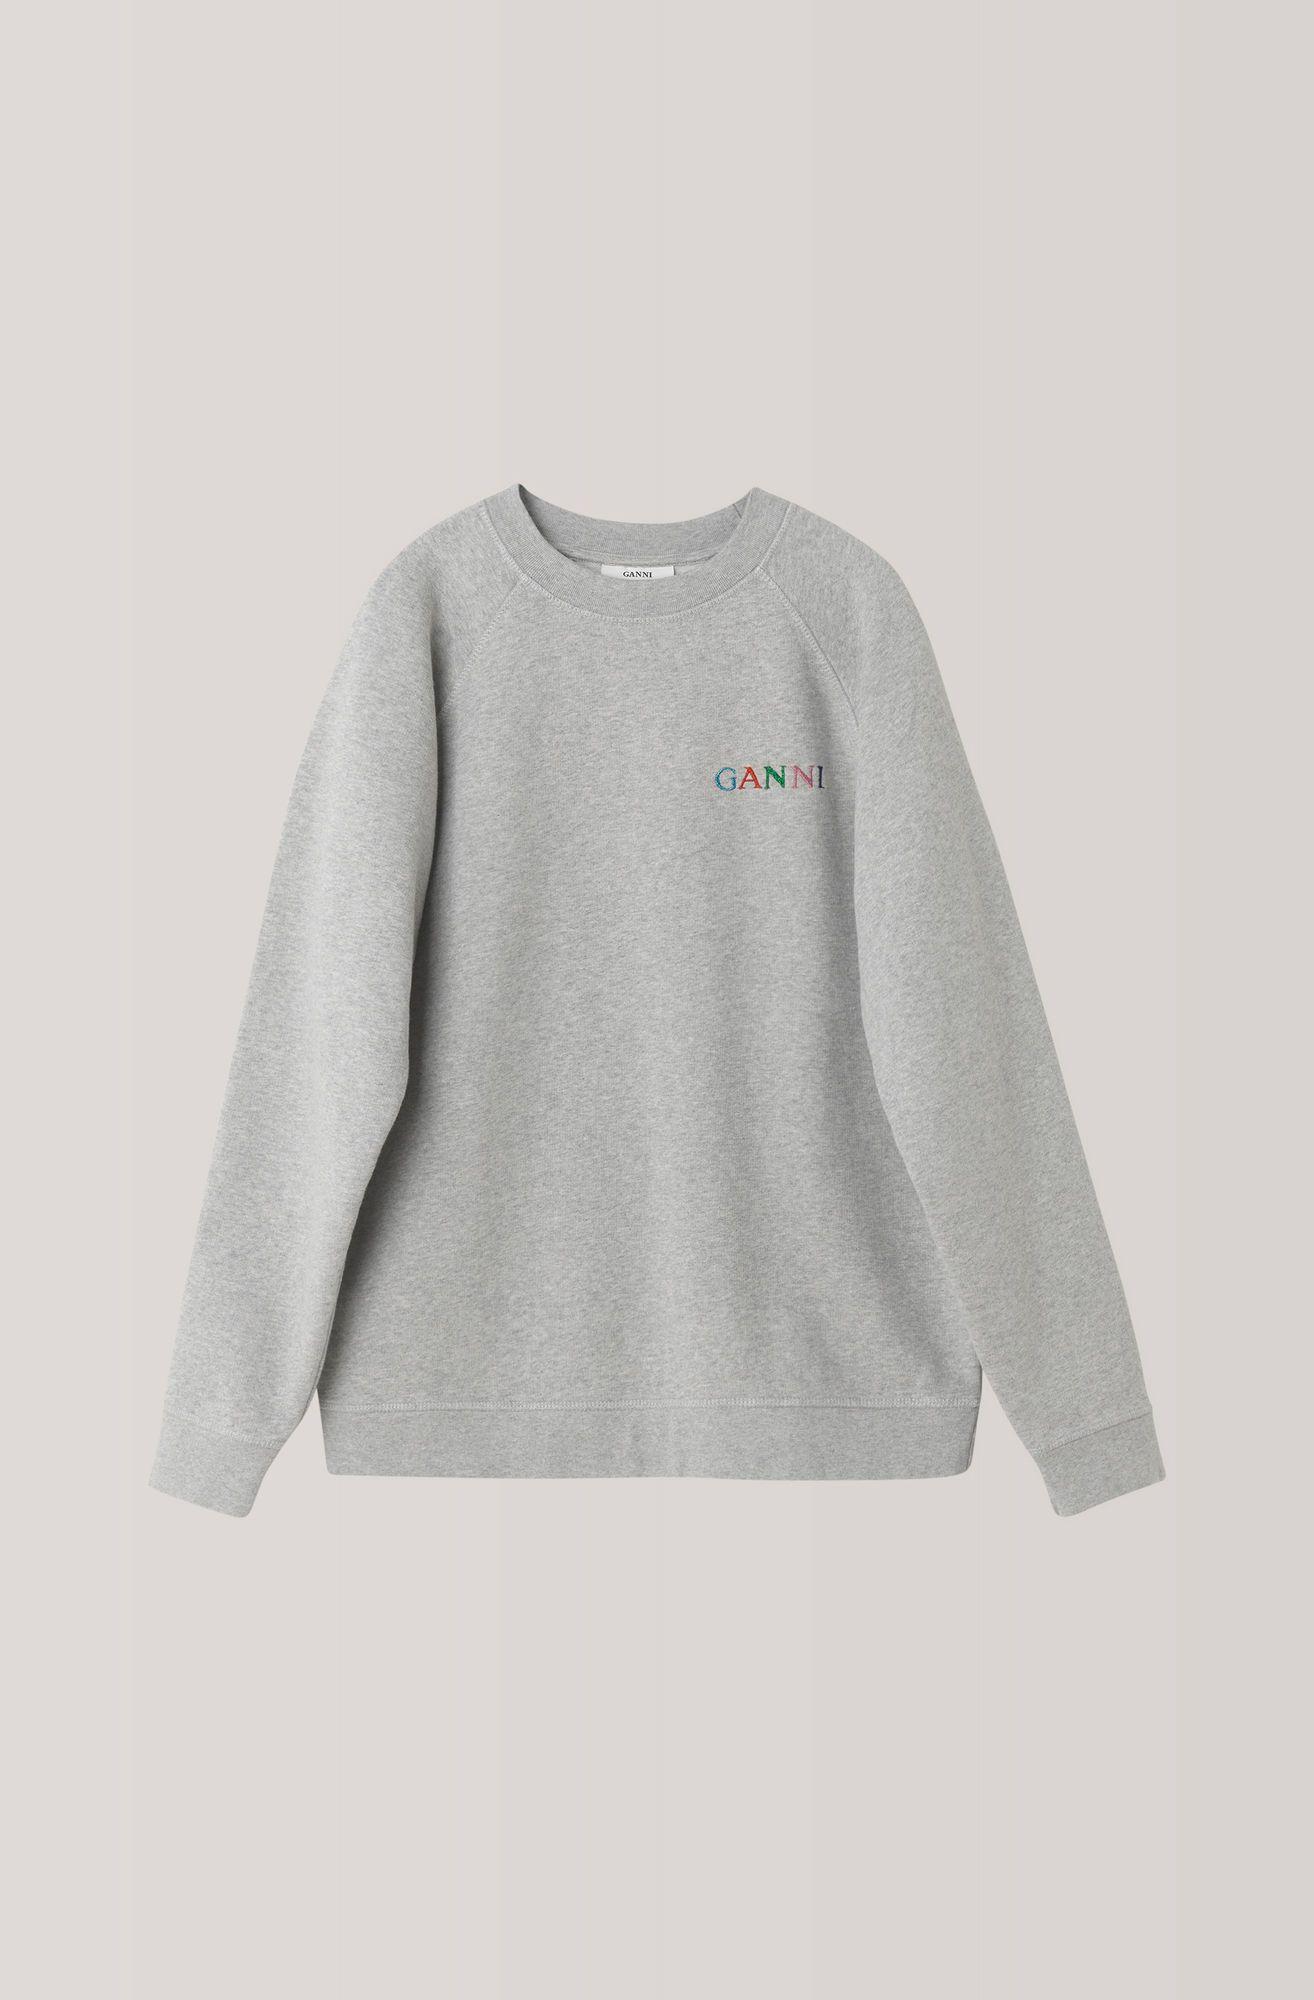 Lott Isoli Sweatshirt Multi Paloma Melange Polo Shirt Outfits Sweatshirts Clothes [ 2000 x 1314 Pixel ]